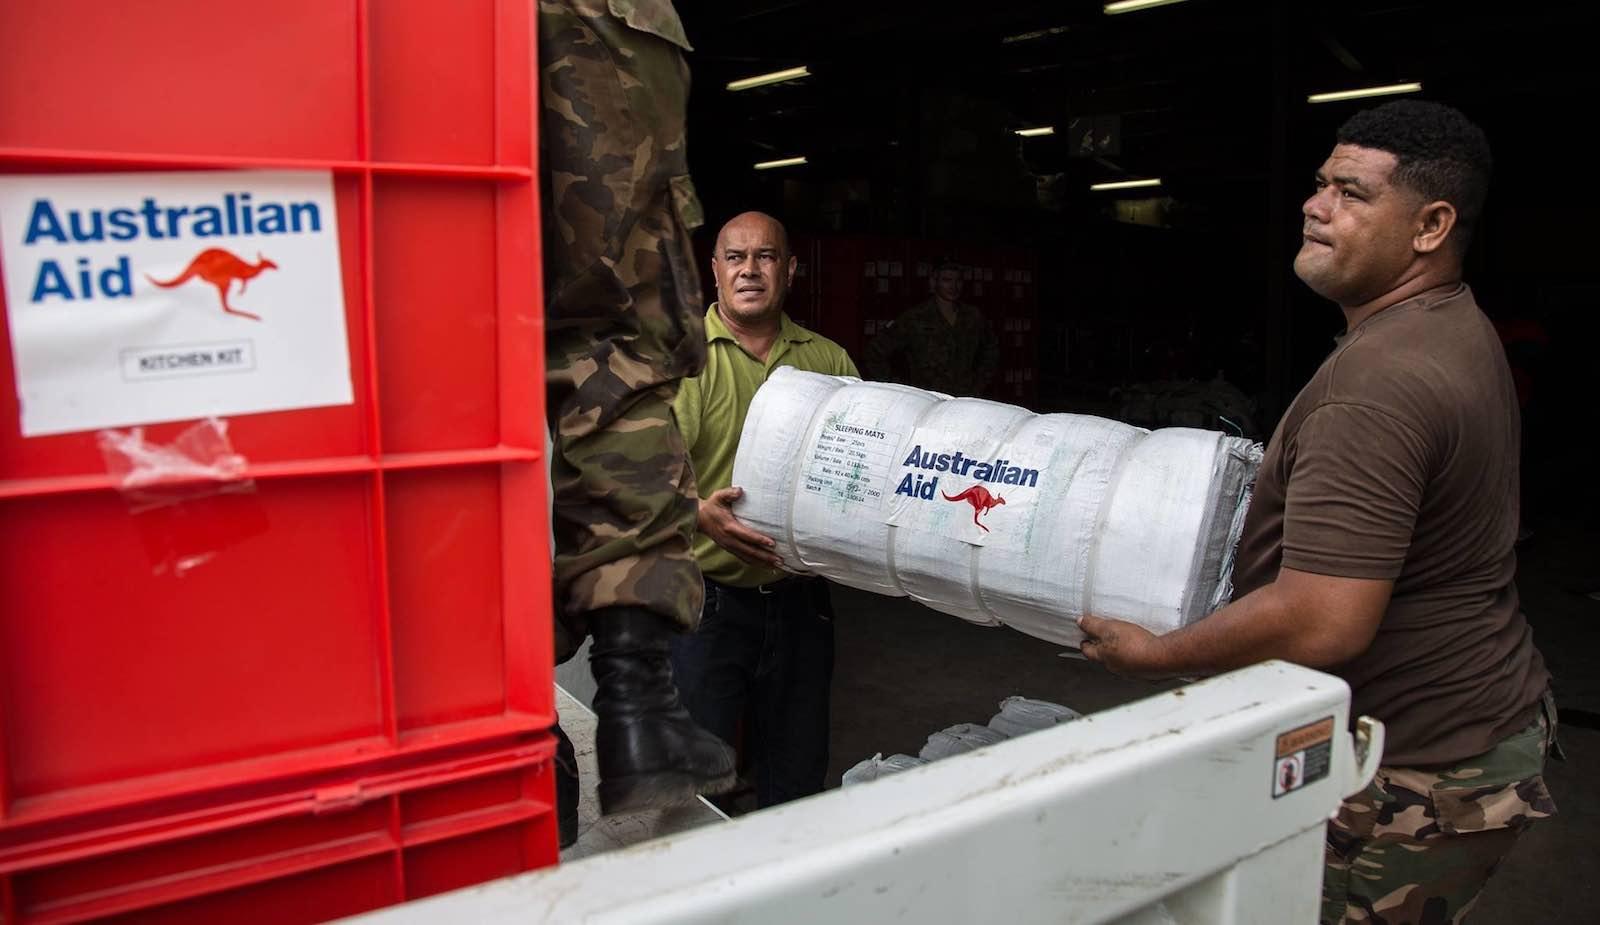 A volunteer helps a Tonga Defense Service soldier unload Australian aid supplies after Cyclone Gita, May 2018 (Photo: AHC Nakualofa/Flickr)